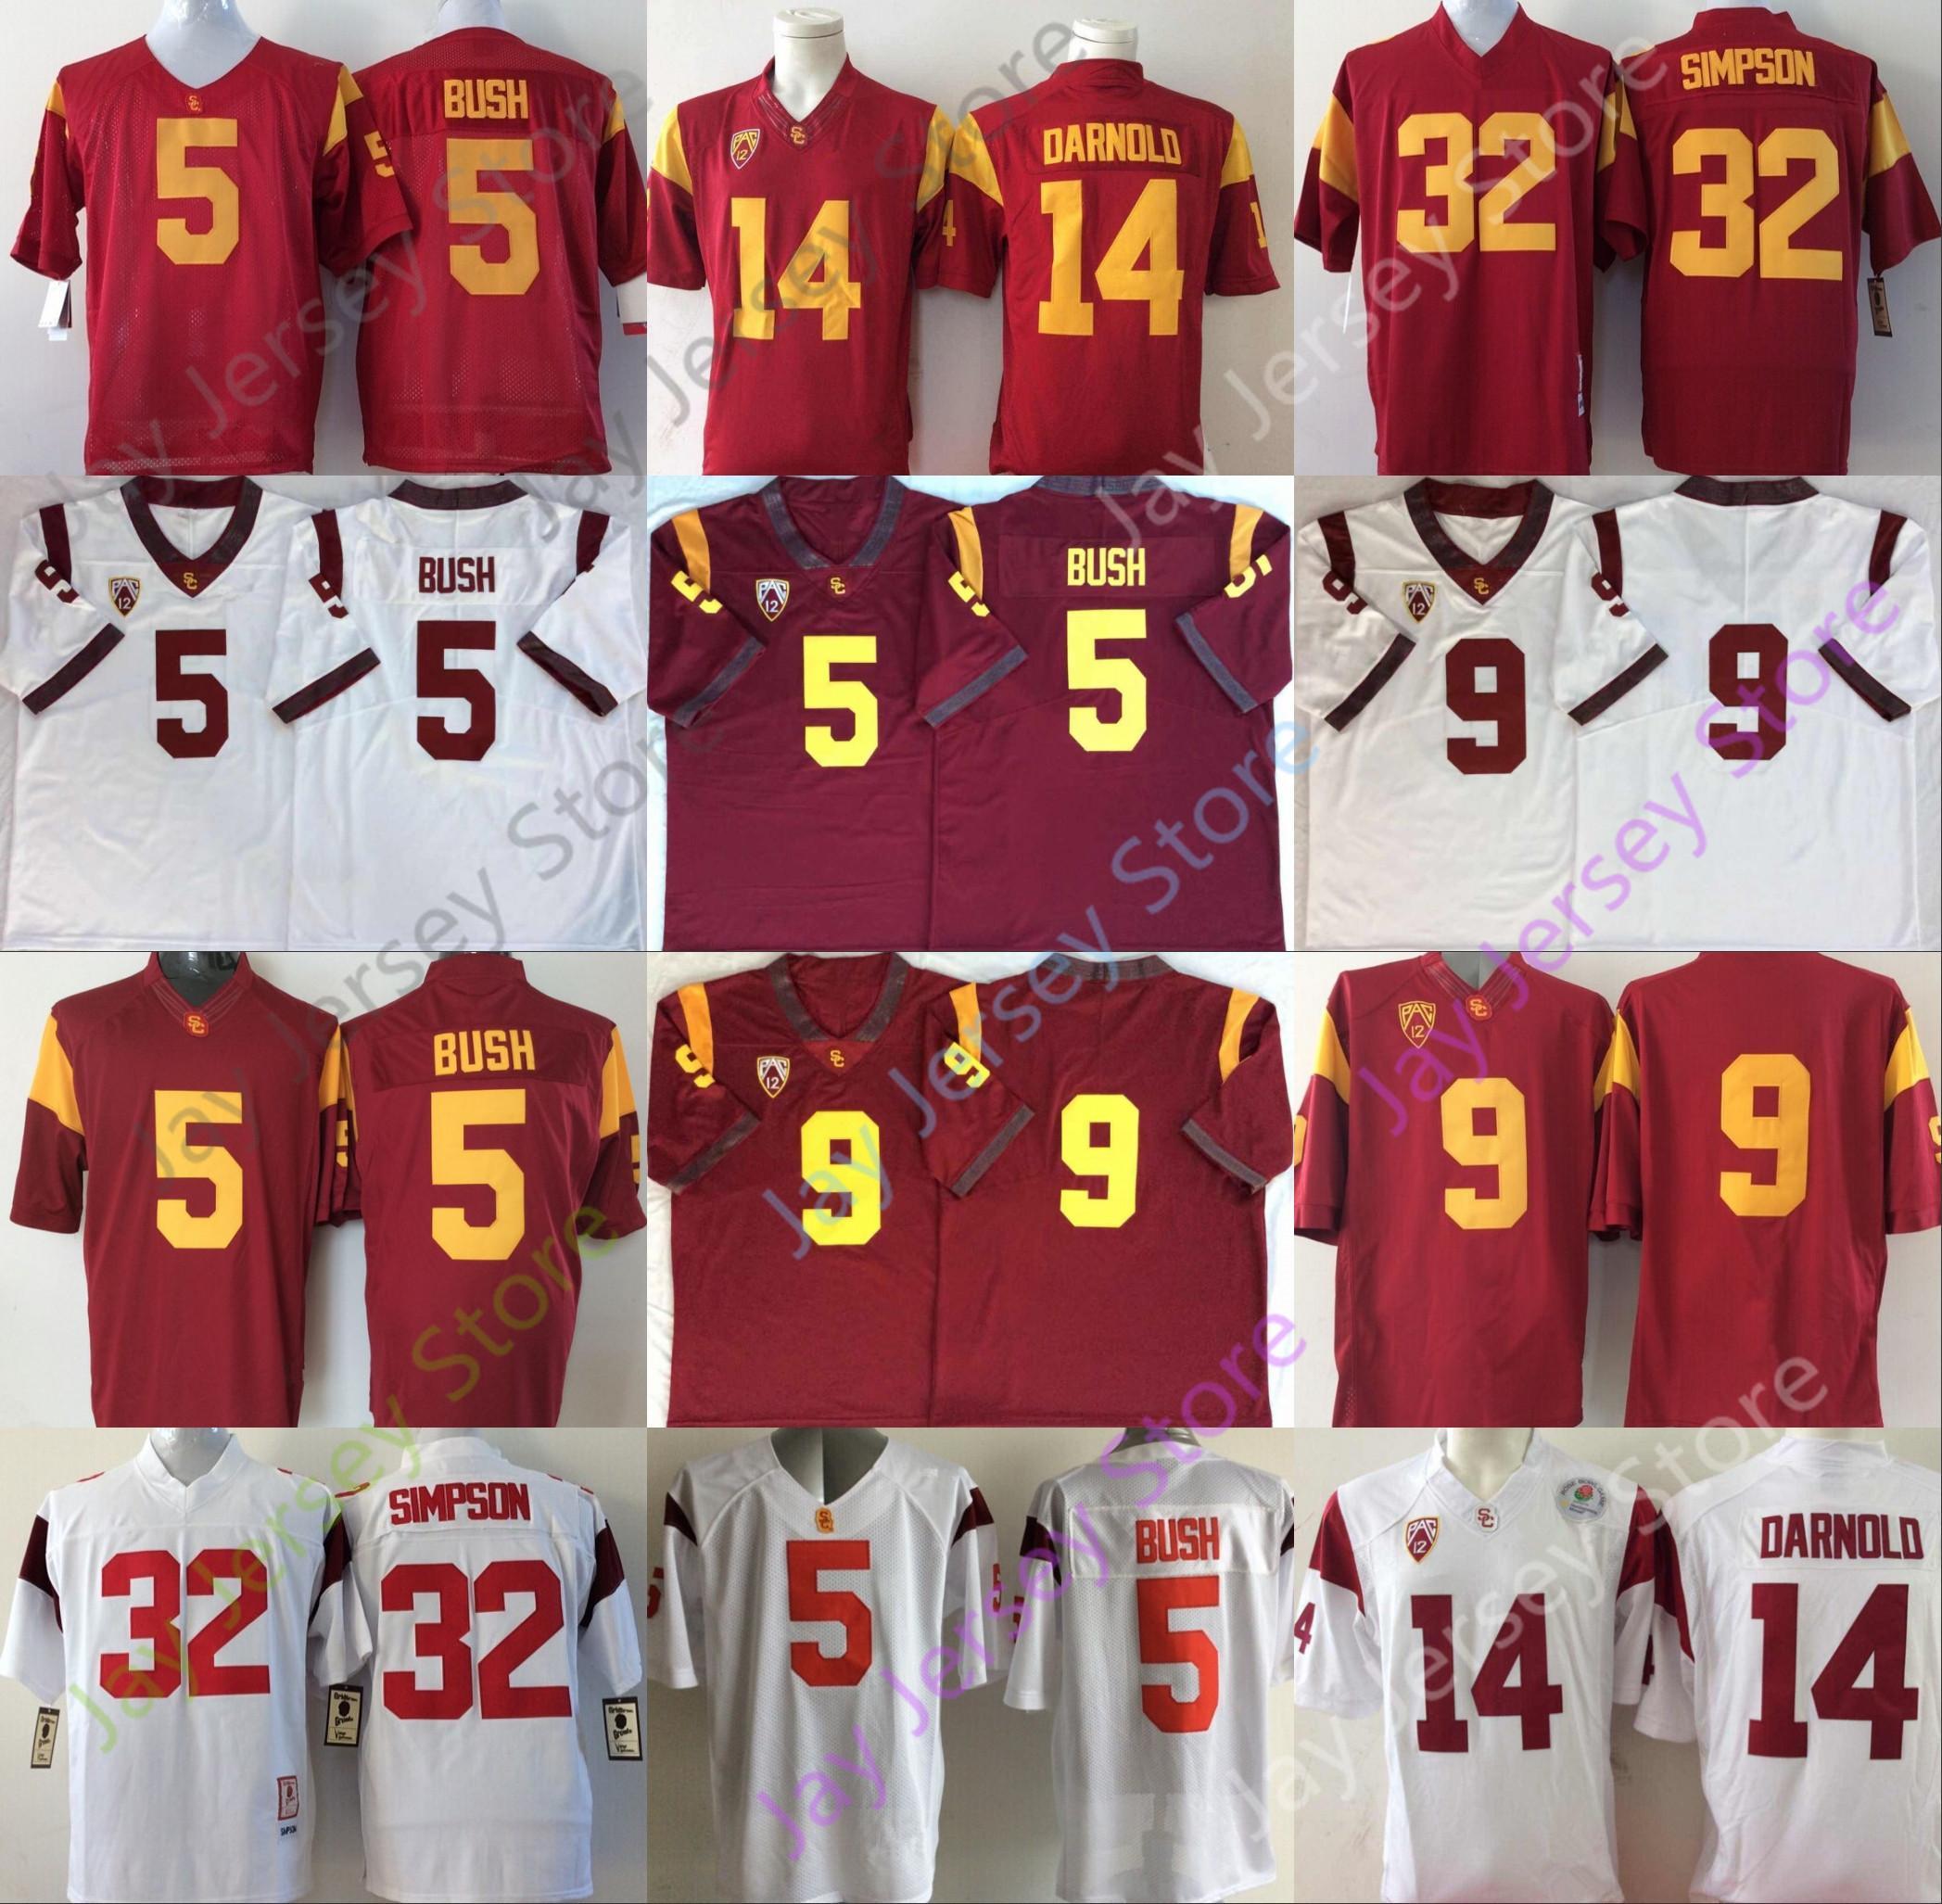 USC Troans Southern California Football Jersey NCAA College 5 Reggie Bush 9 JuJu Smith-Schuster 14 Sam Darnold 32 O. J Simpson Size S-3XL